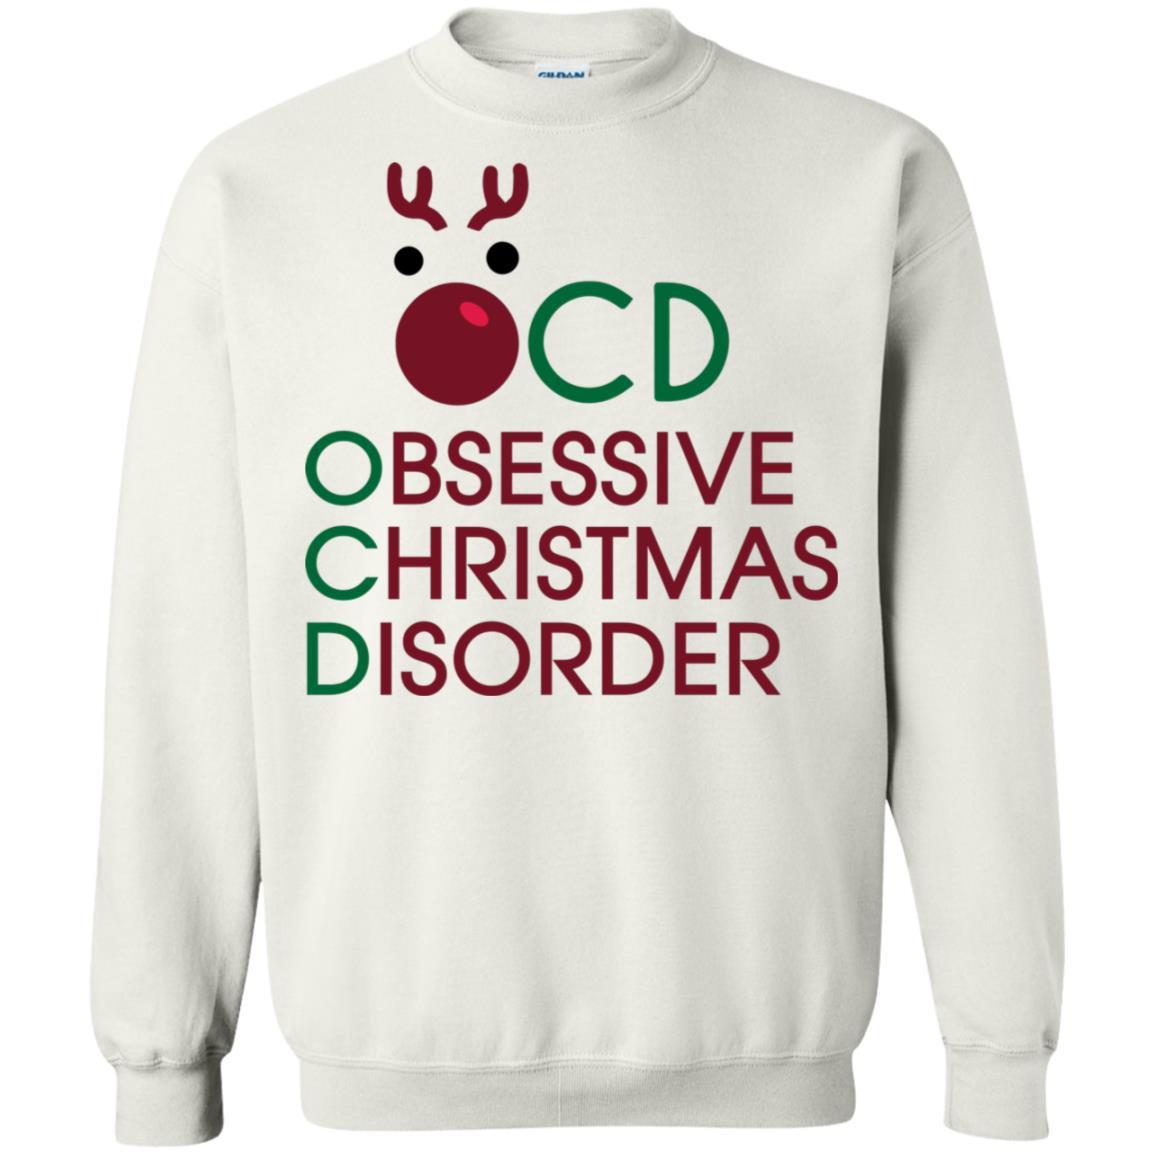 OCD Obsessive Christmas Disorder shirt, hoodie, long sleeve